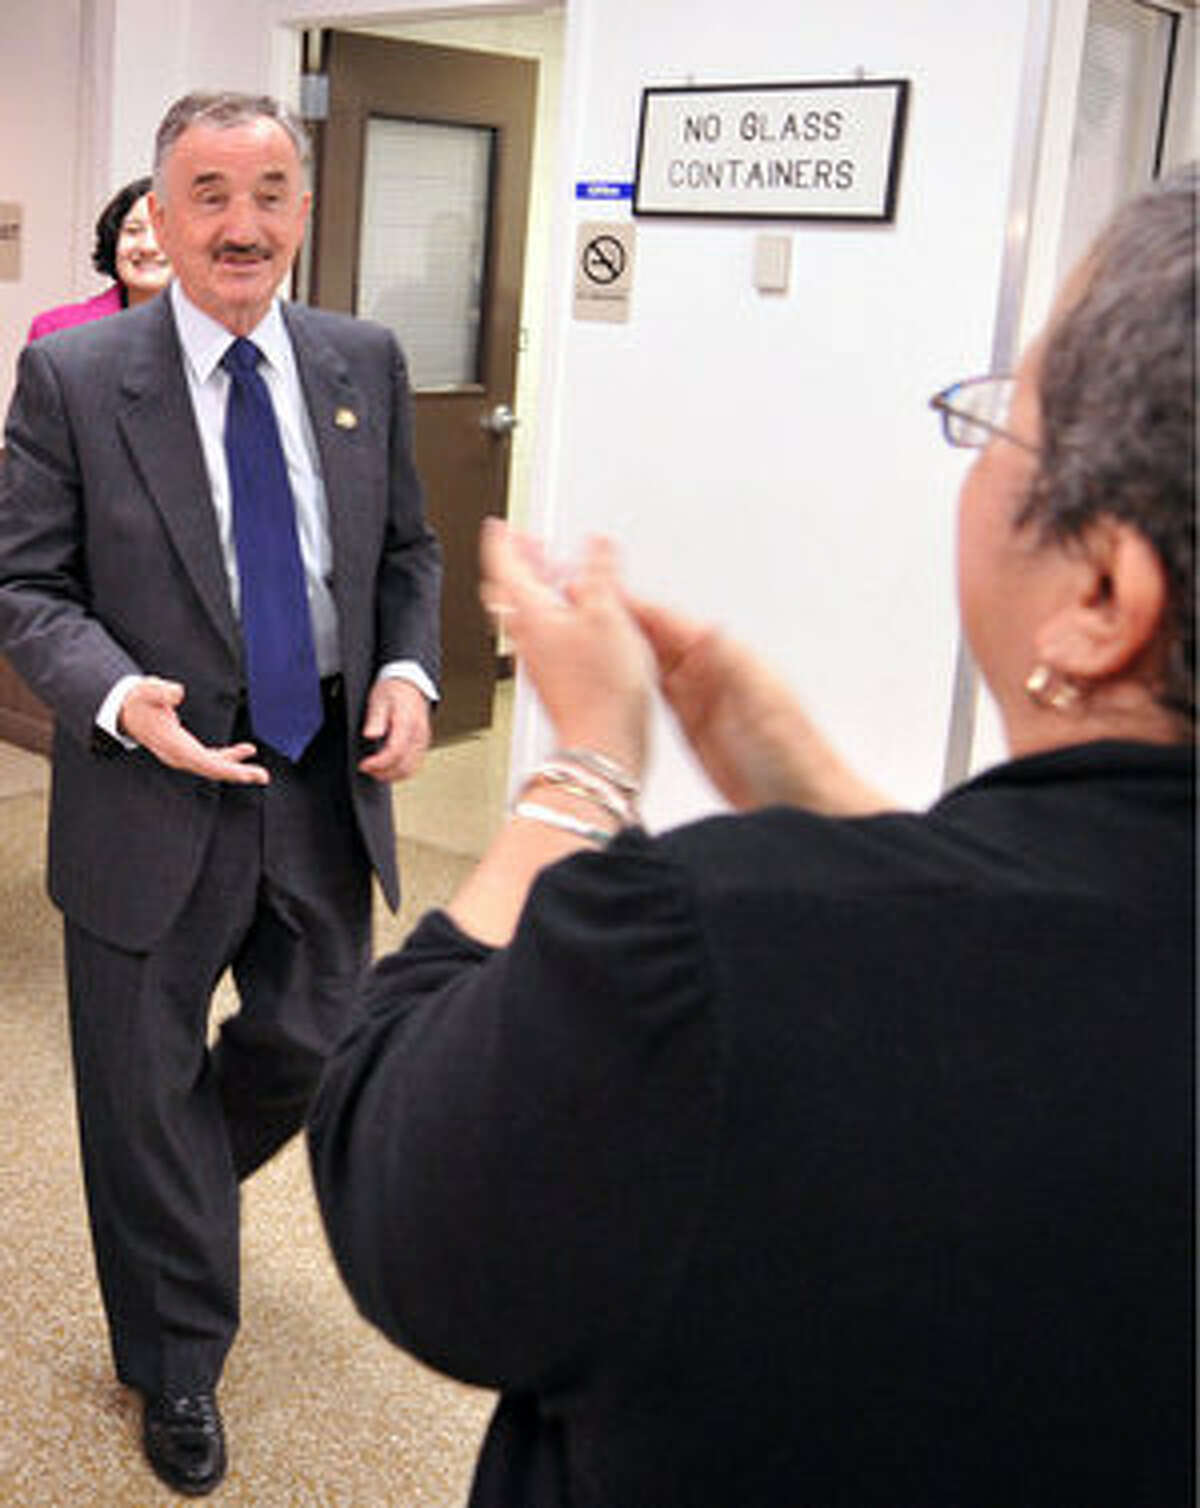 District 23 incumbent Ciro Rodriguez handily won the Democratic primary over opponent Miguel Ortiz. Ortiz conceded the race.